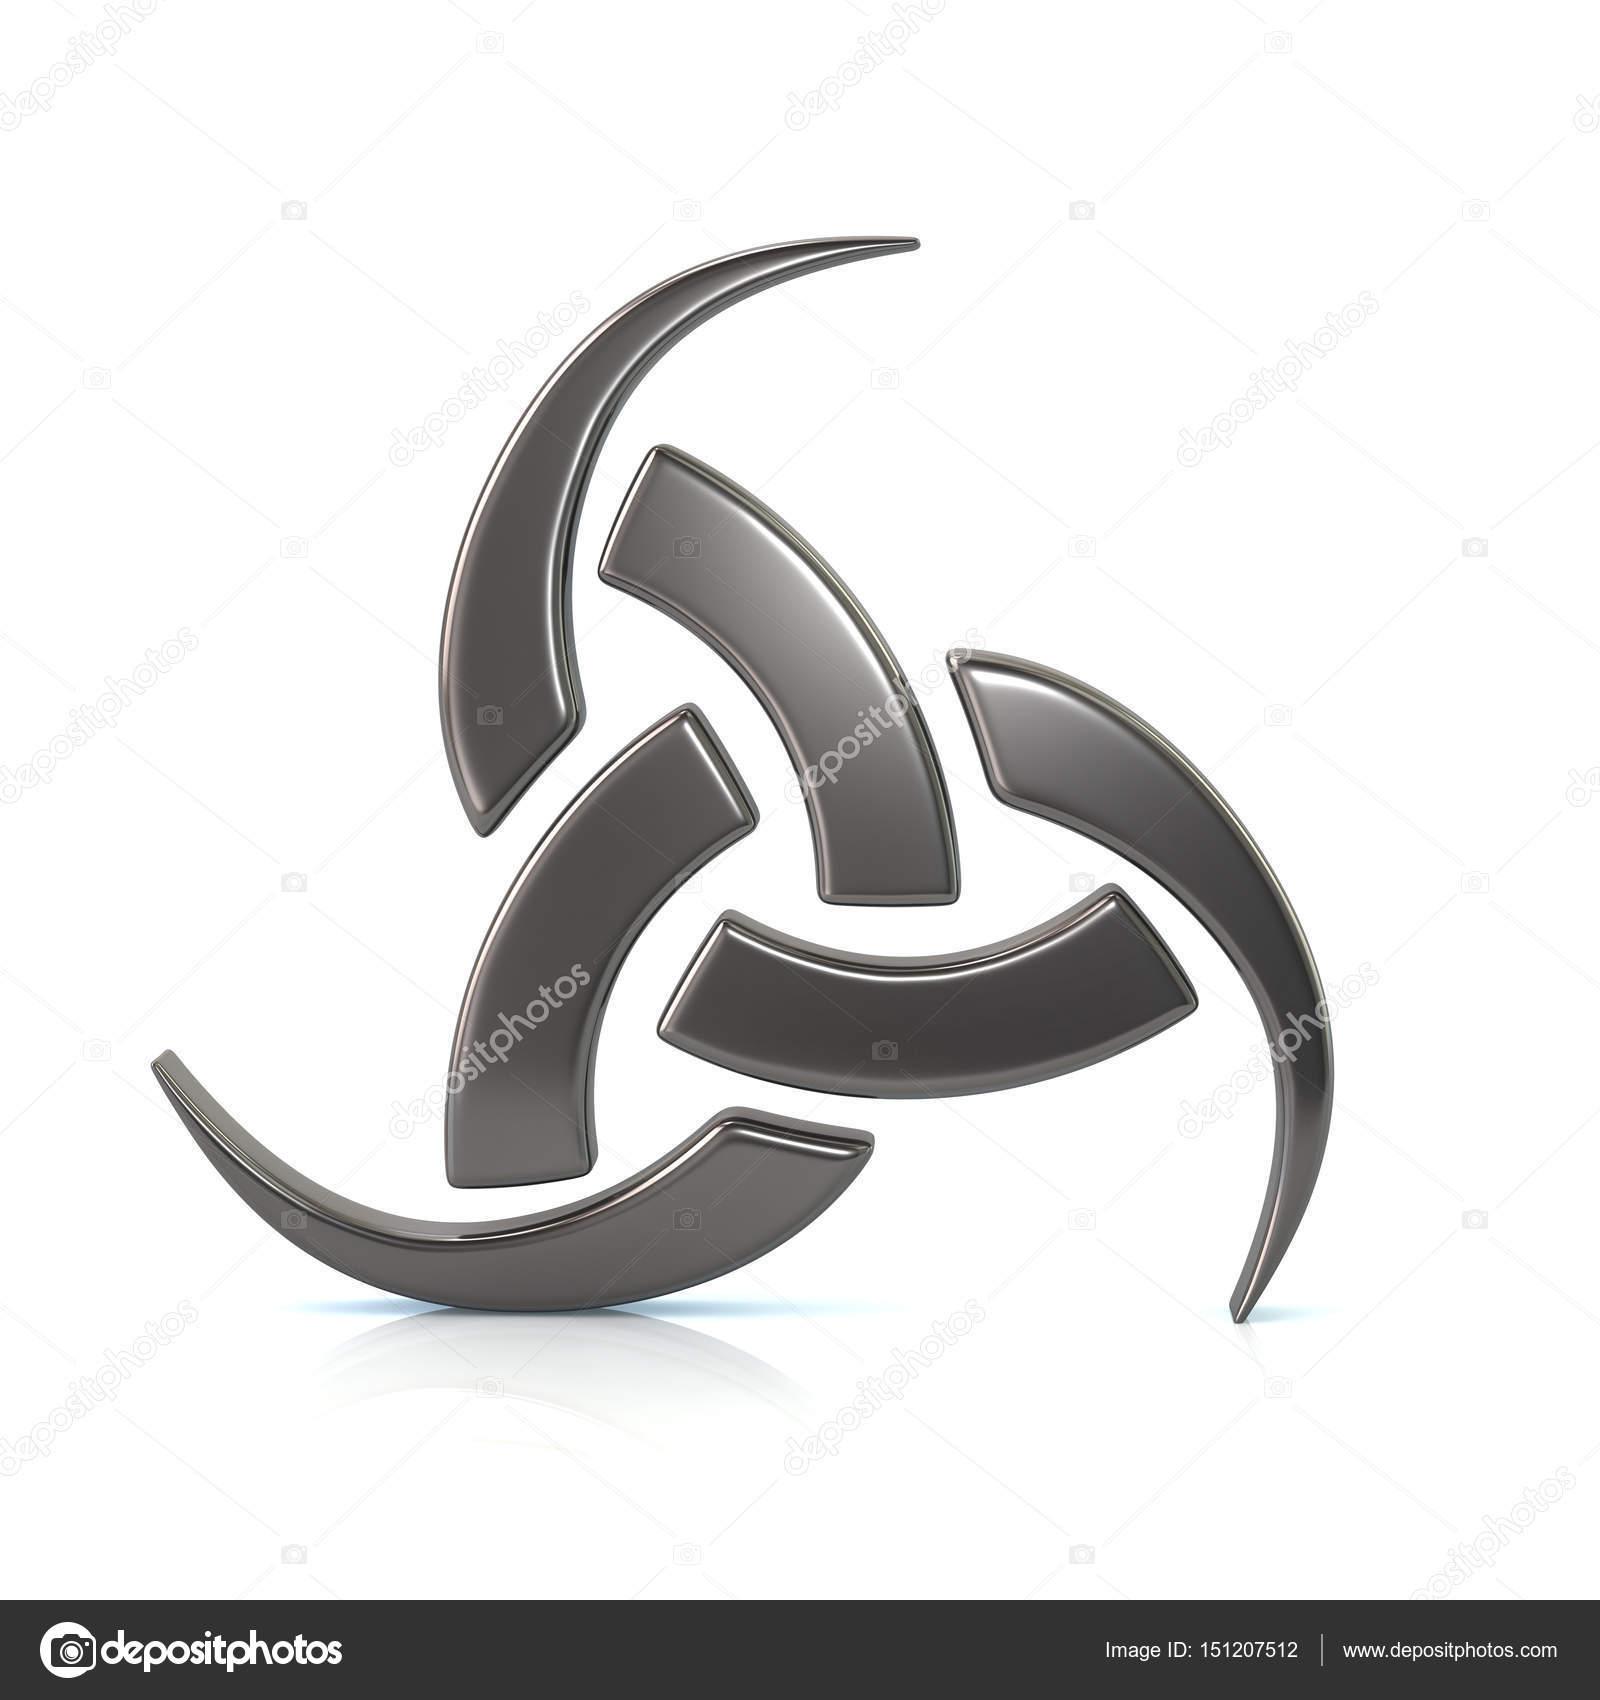 Silver triple horn of odin stock photo valdum 151207512 silver triple horn of odin stock photo buycottarizona